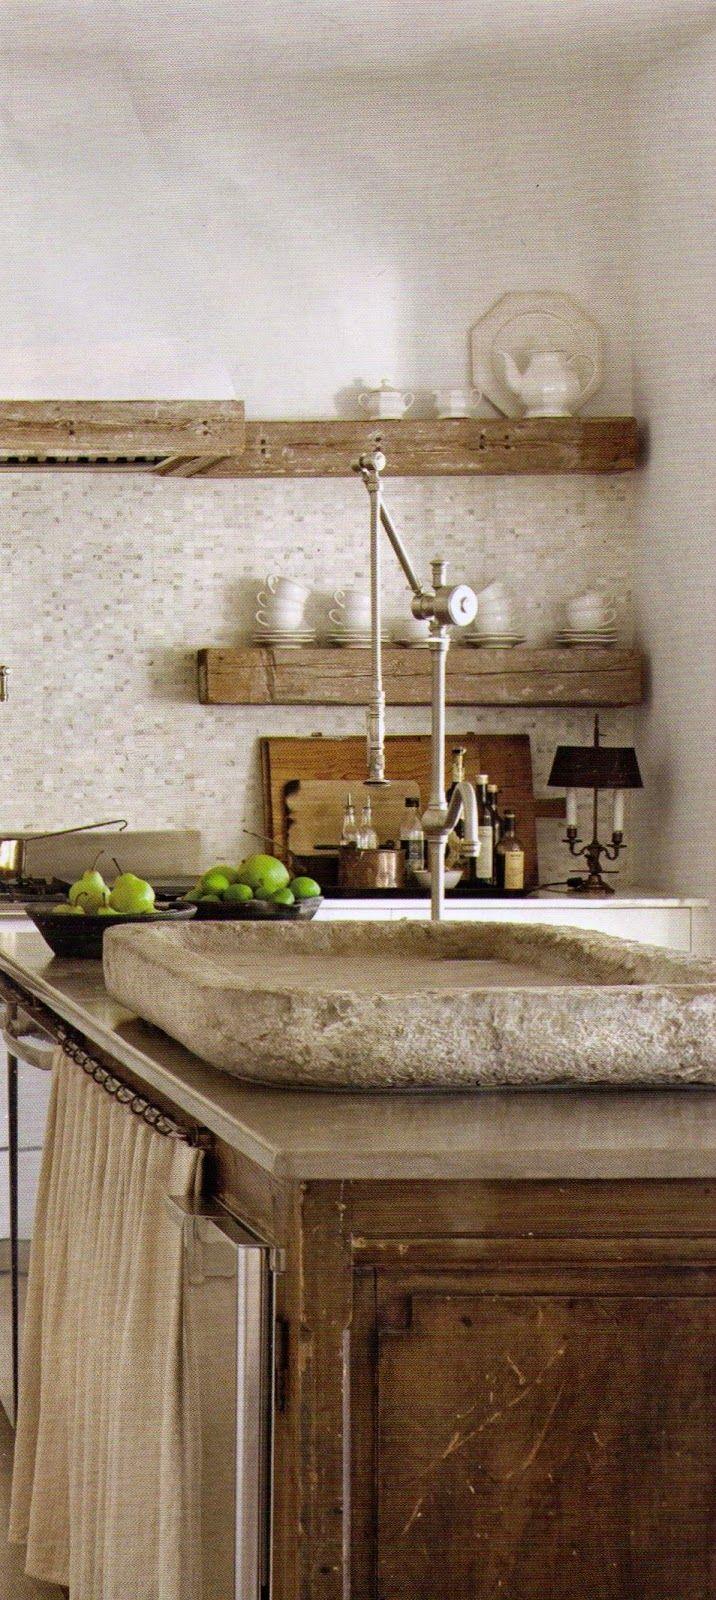 best 25+ stone sink ideas on pinterest